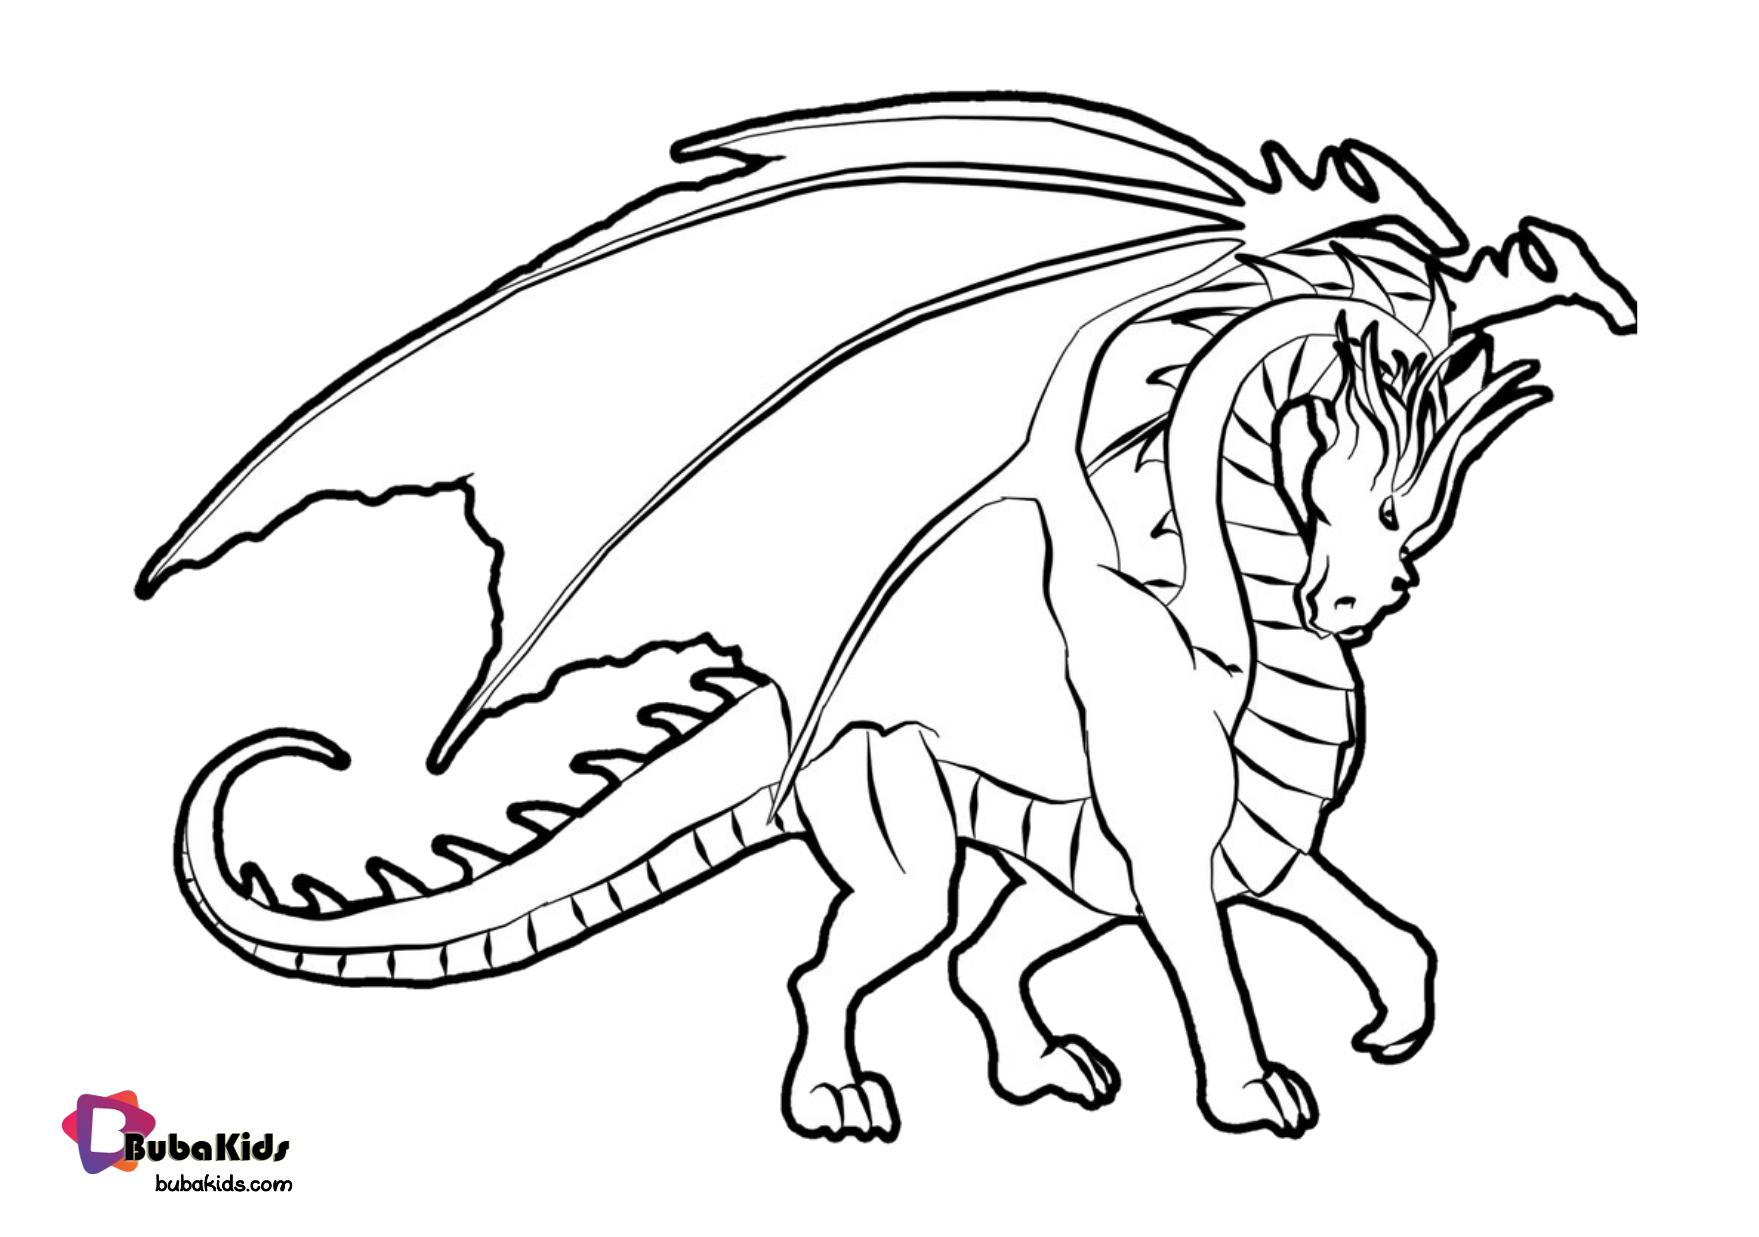 Pin On Mythological Creatures